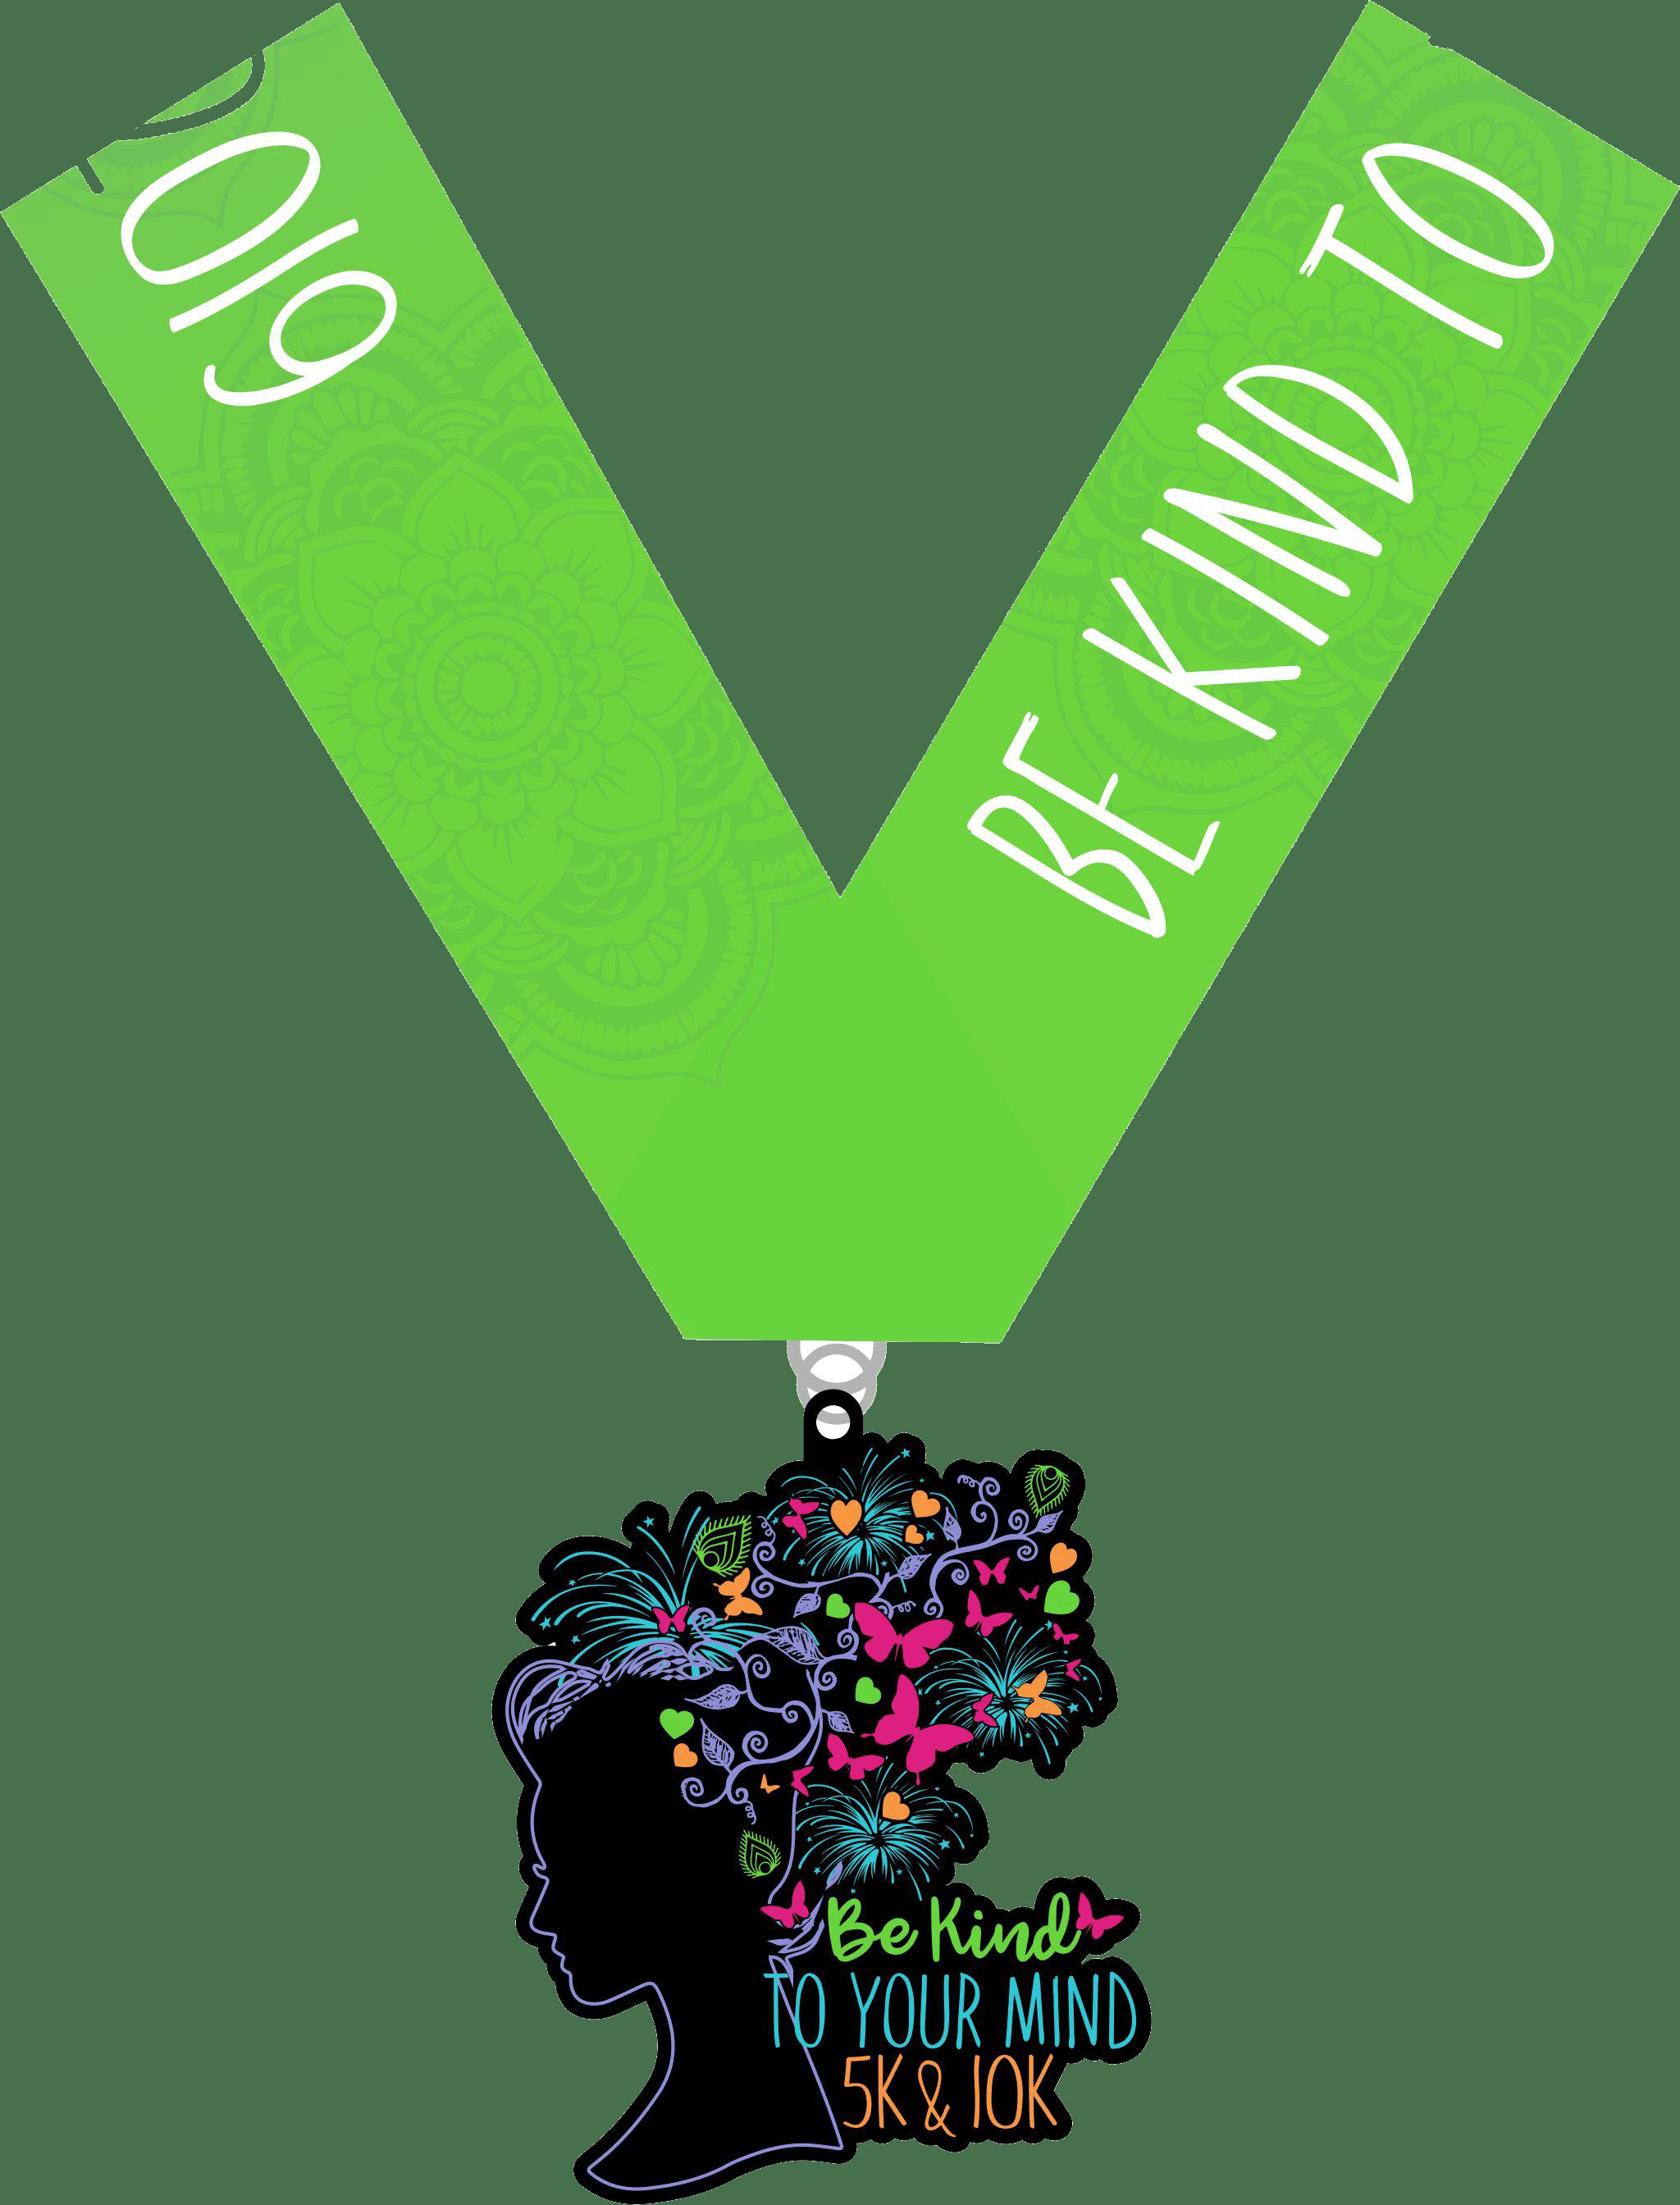 2019 Be Kind To Your Mind 5K & 10K - Tucson